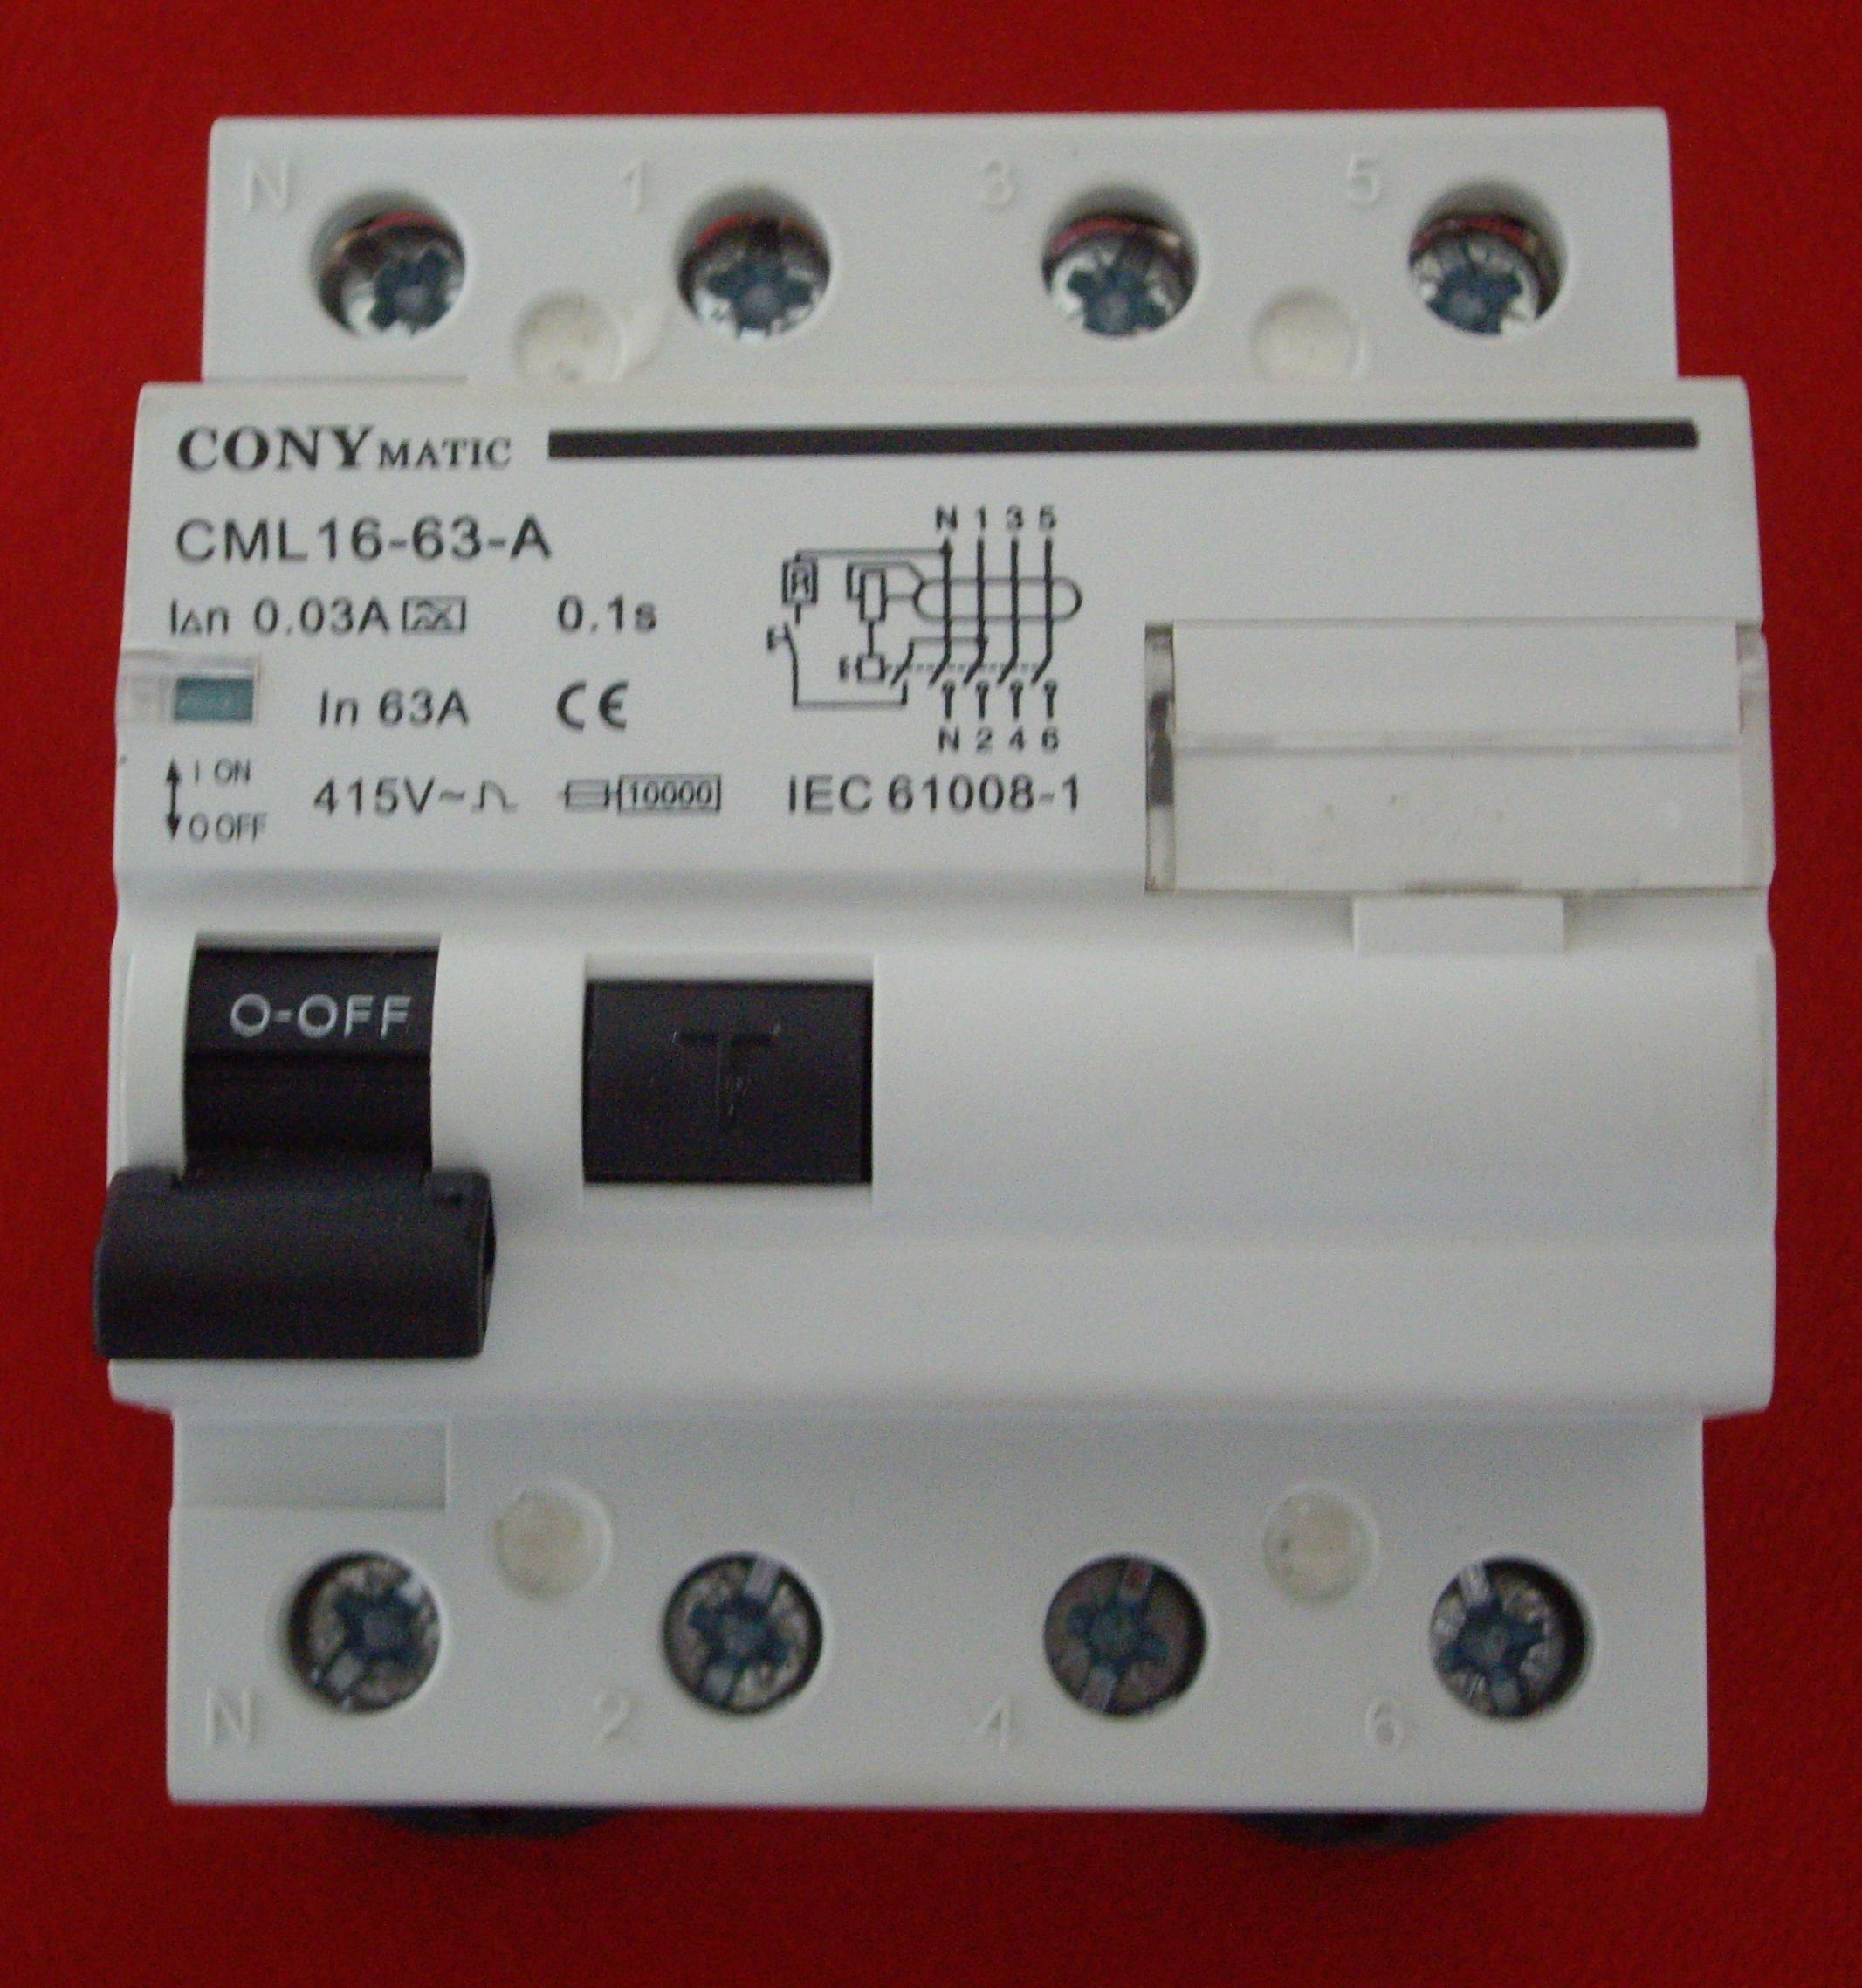 Diferencial S.I.(Super Inmunizado) via-din de 4 Polos, 63 A y 30 mA (D46330A).